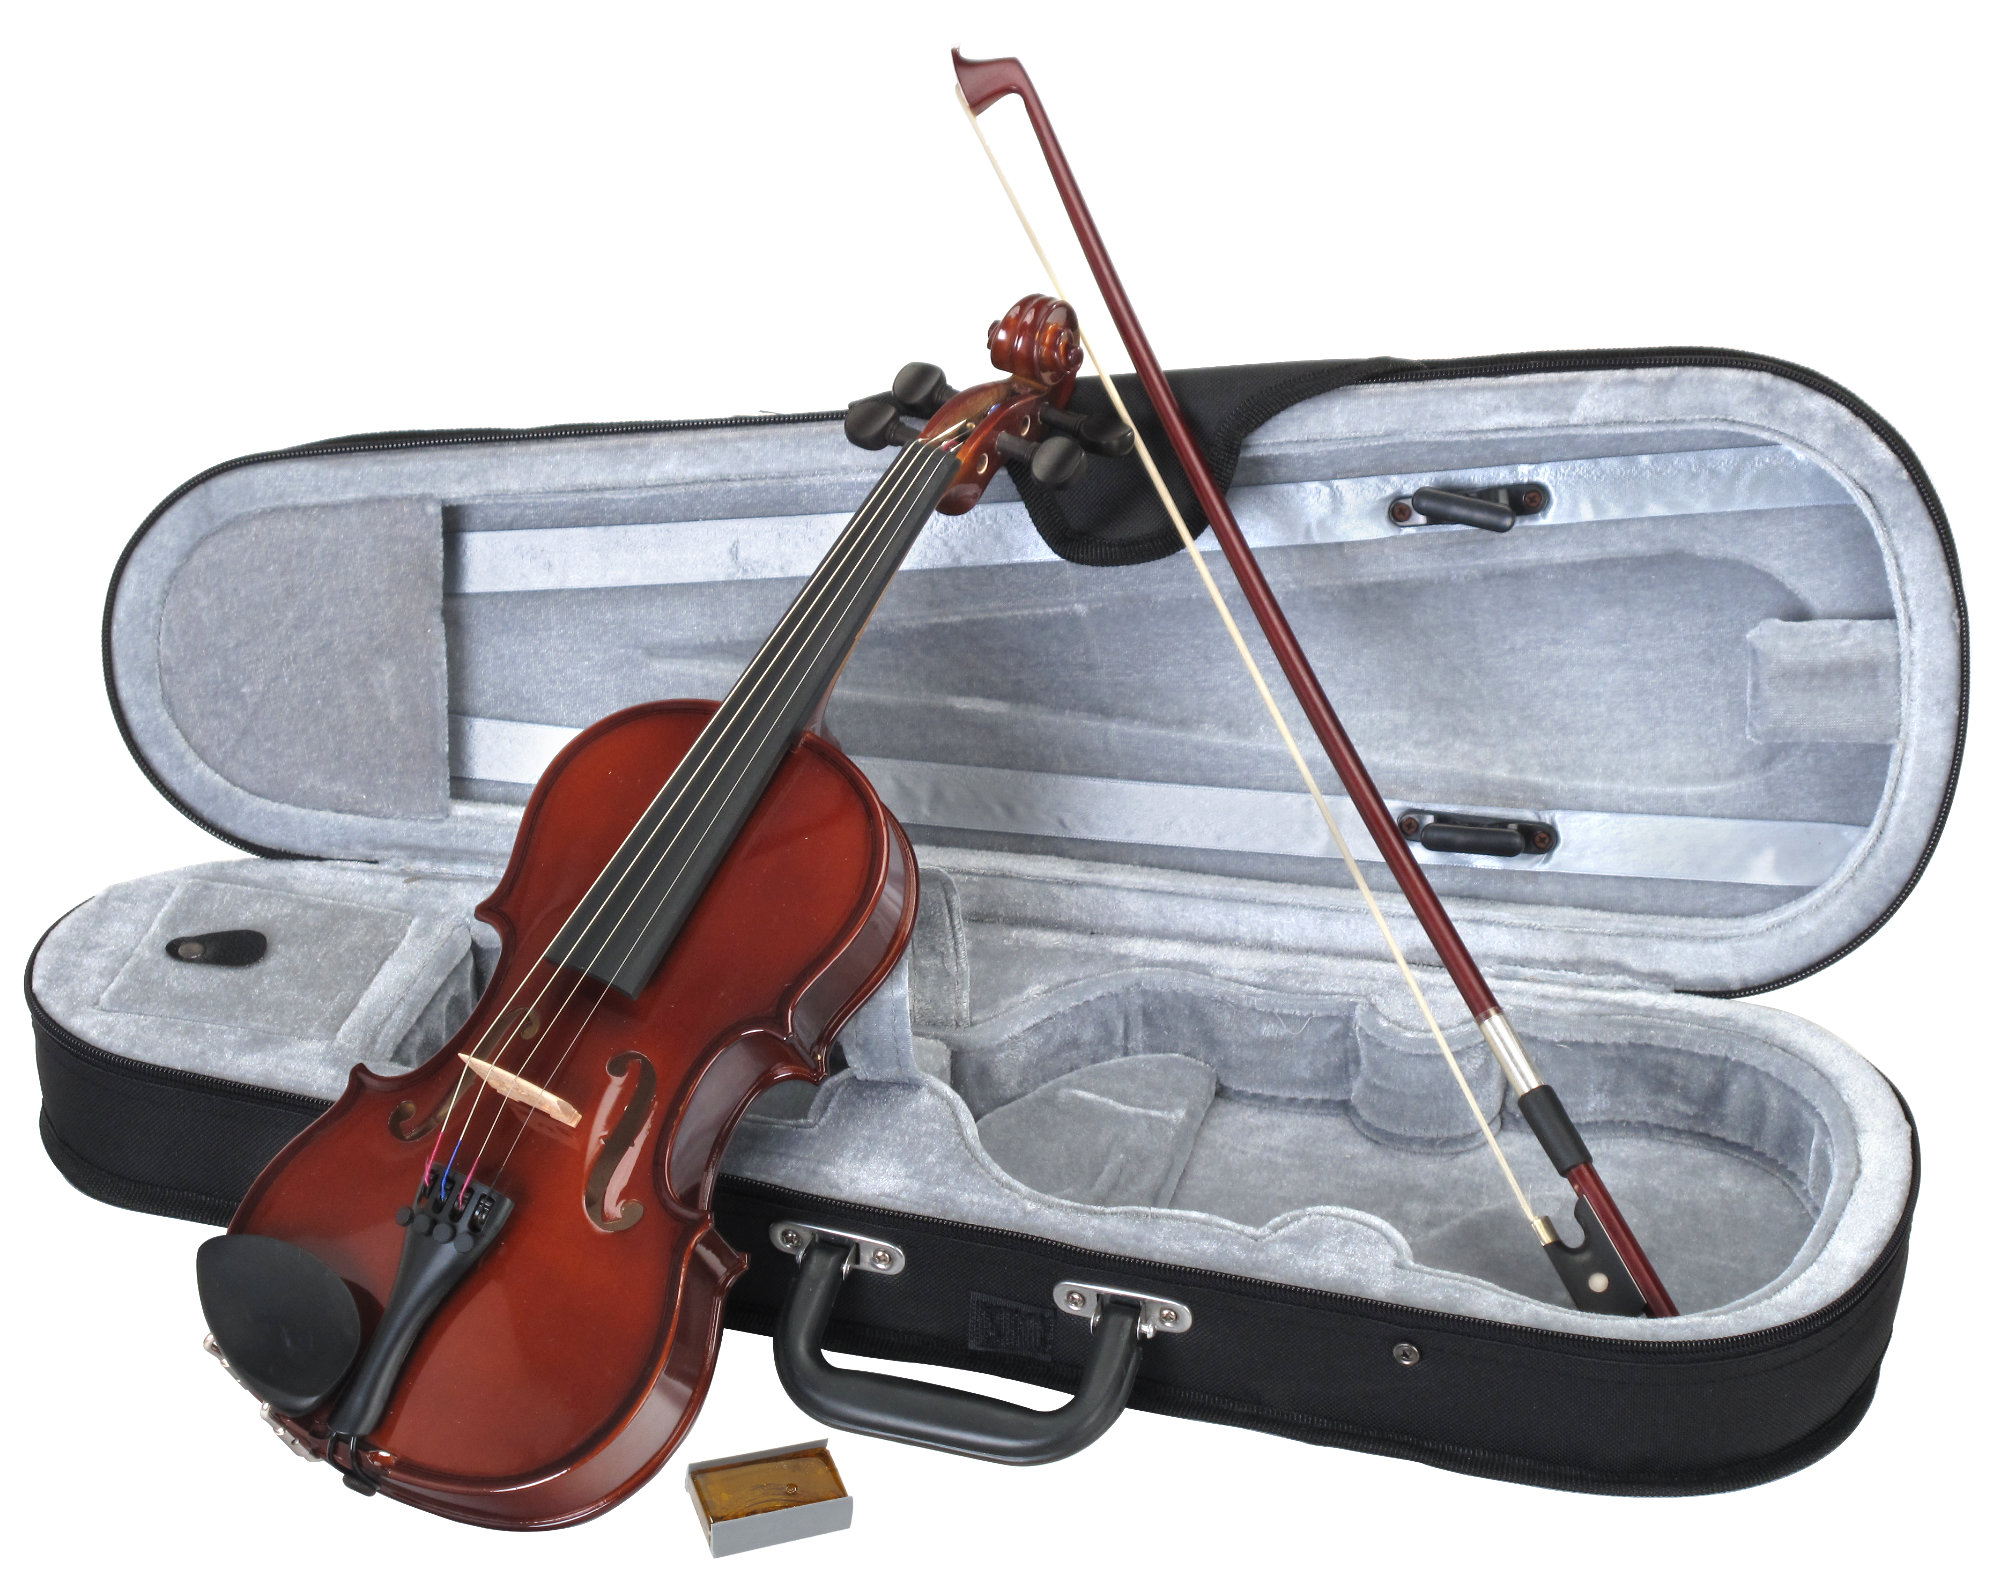 Violinen - Classic Cantabile Student Violinenset 3|4 - Onlineshop Musikhaus Kirstein